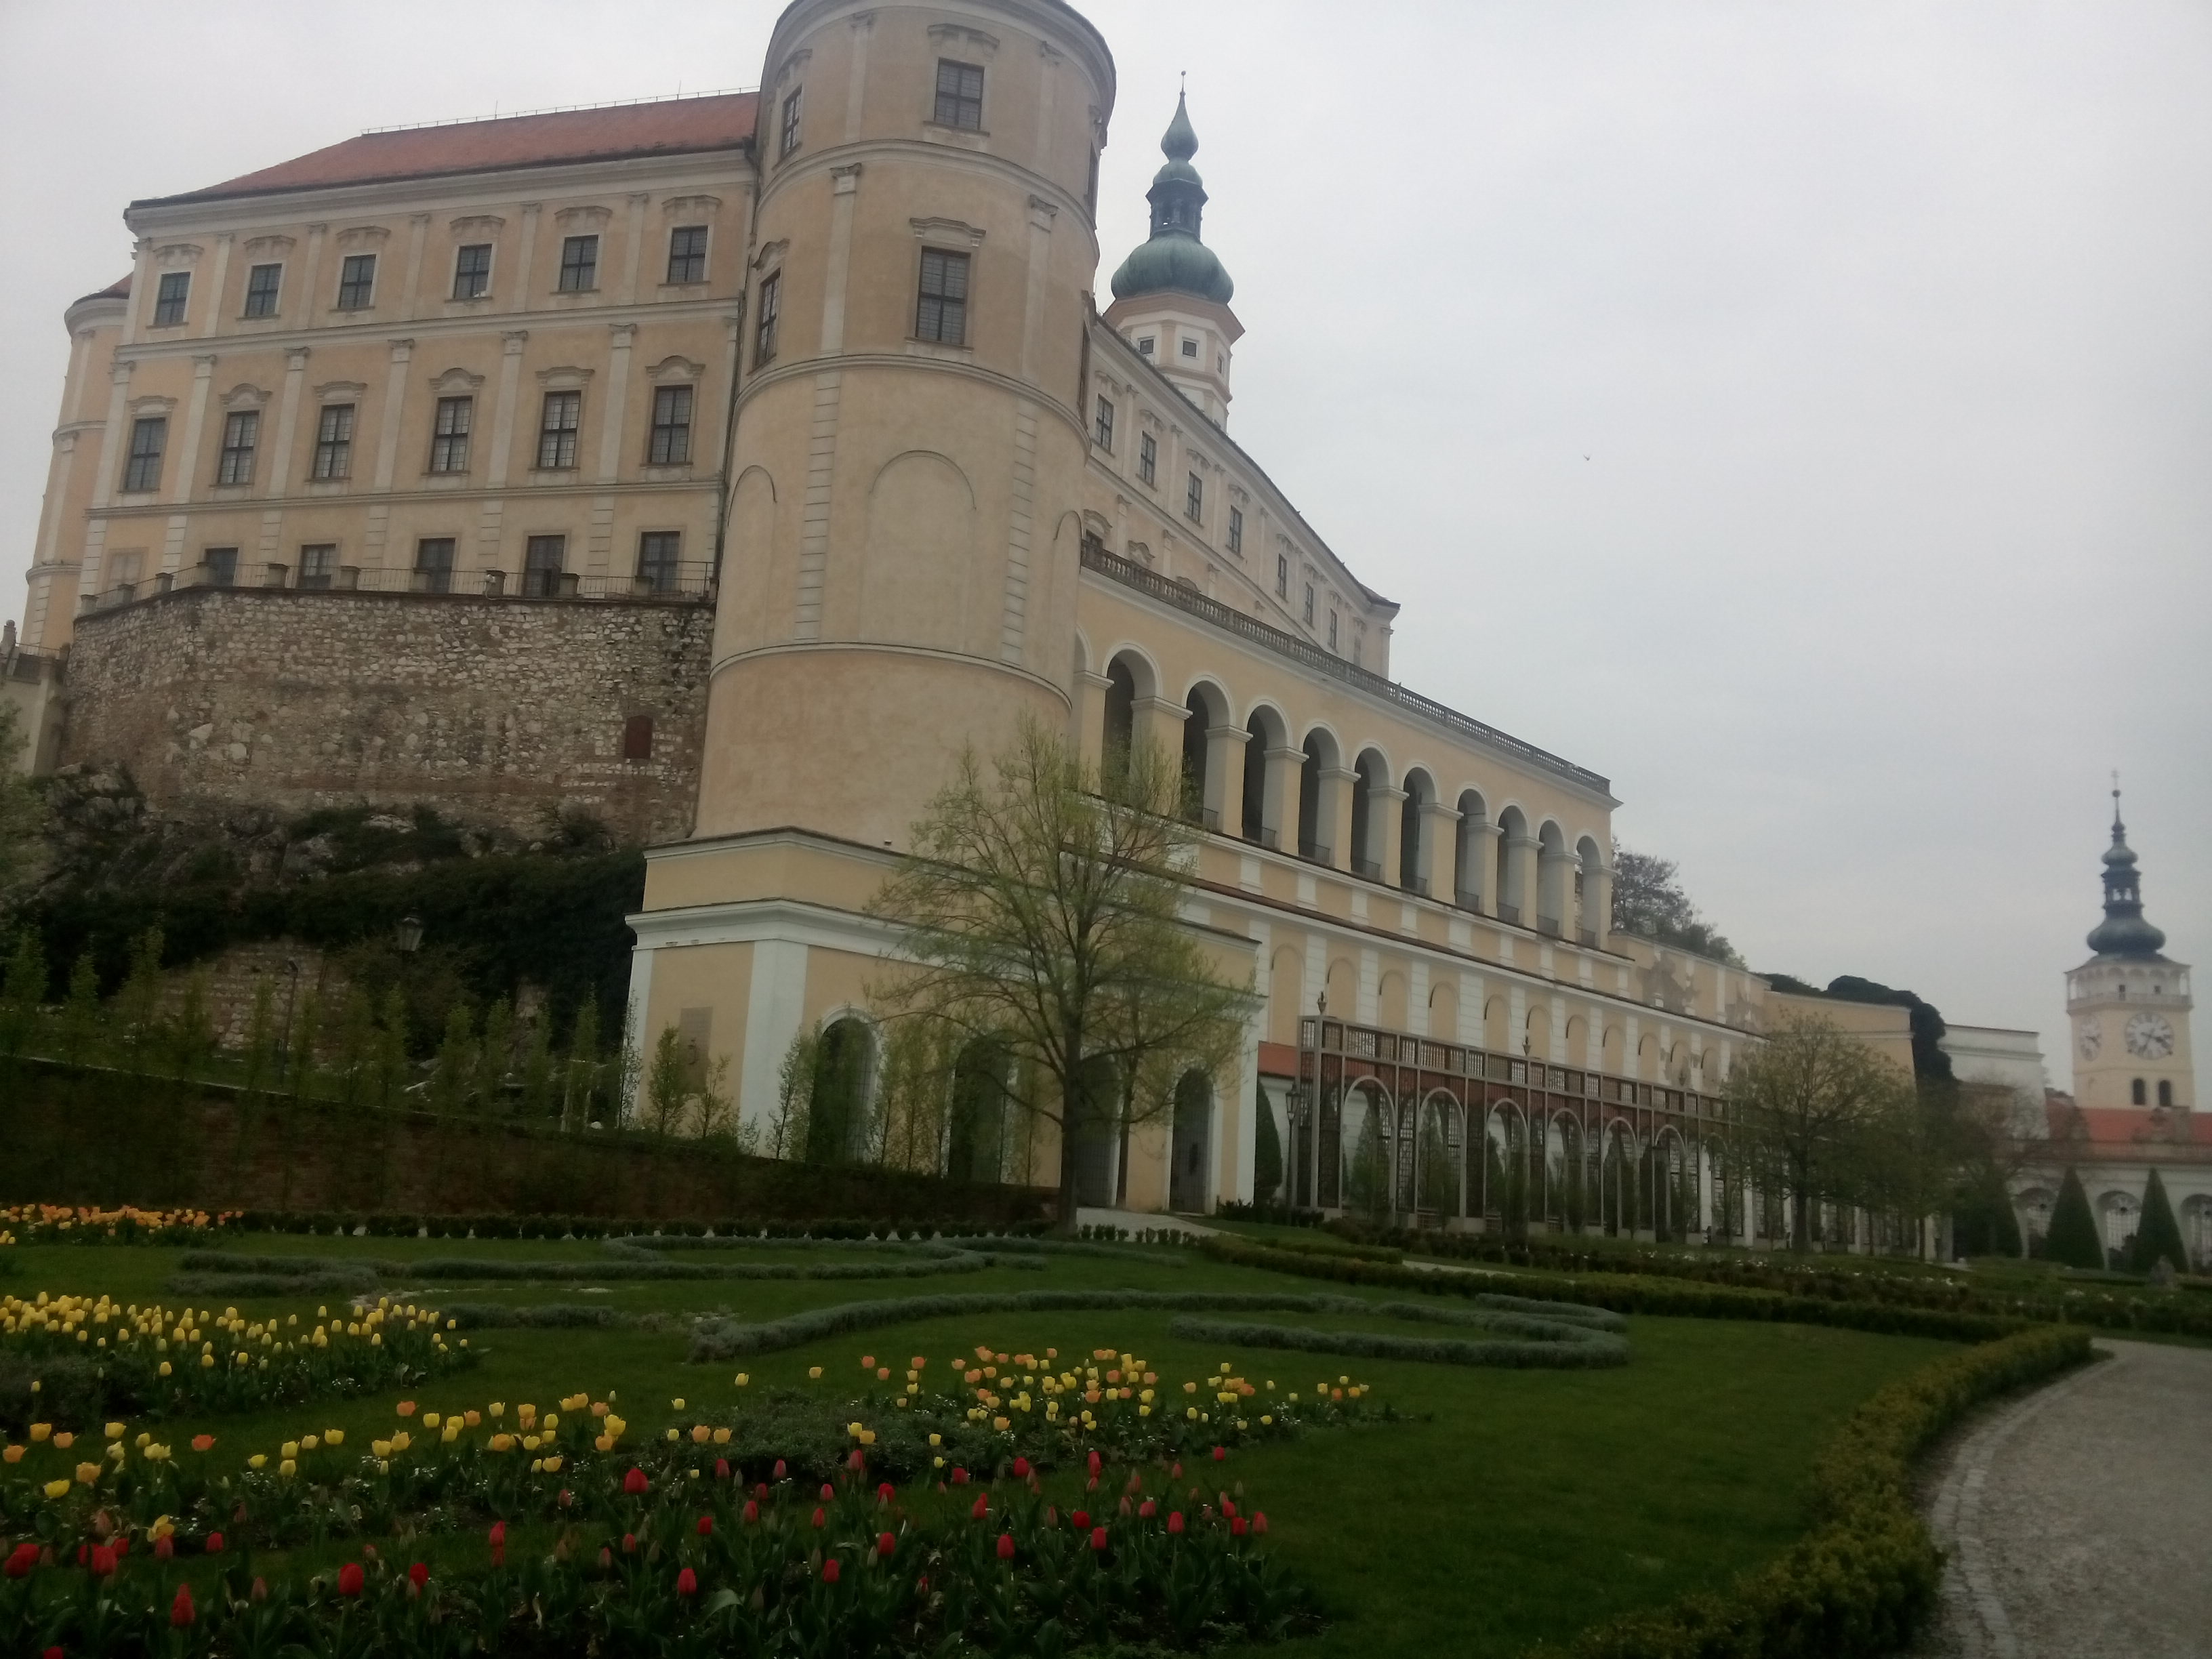 https://i.amy.gy/201804-slovakia-austria-czech/IMG_20180416_153556.jpg